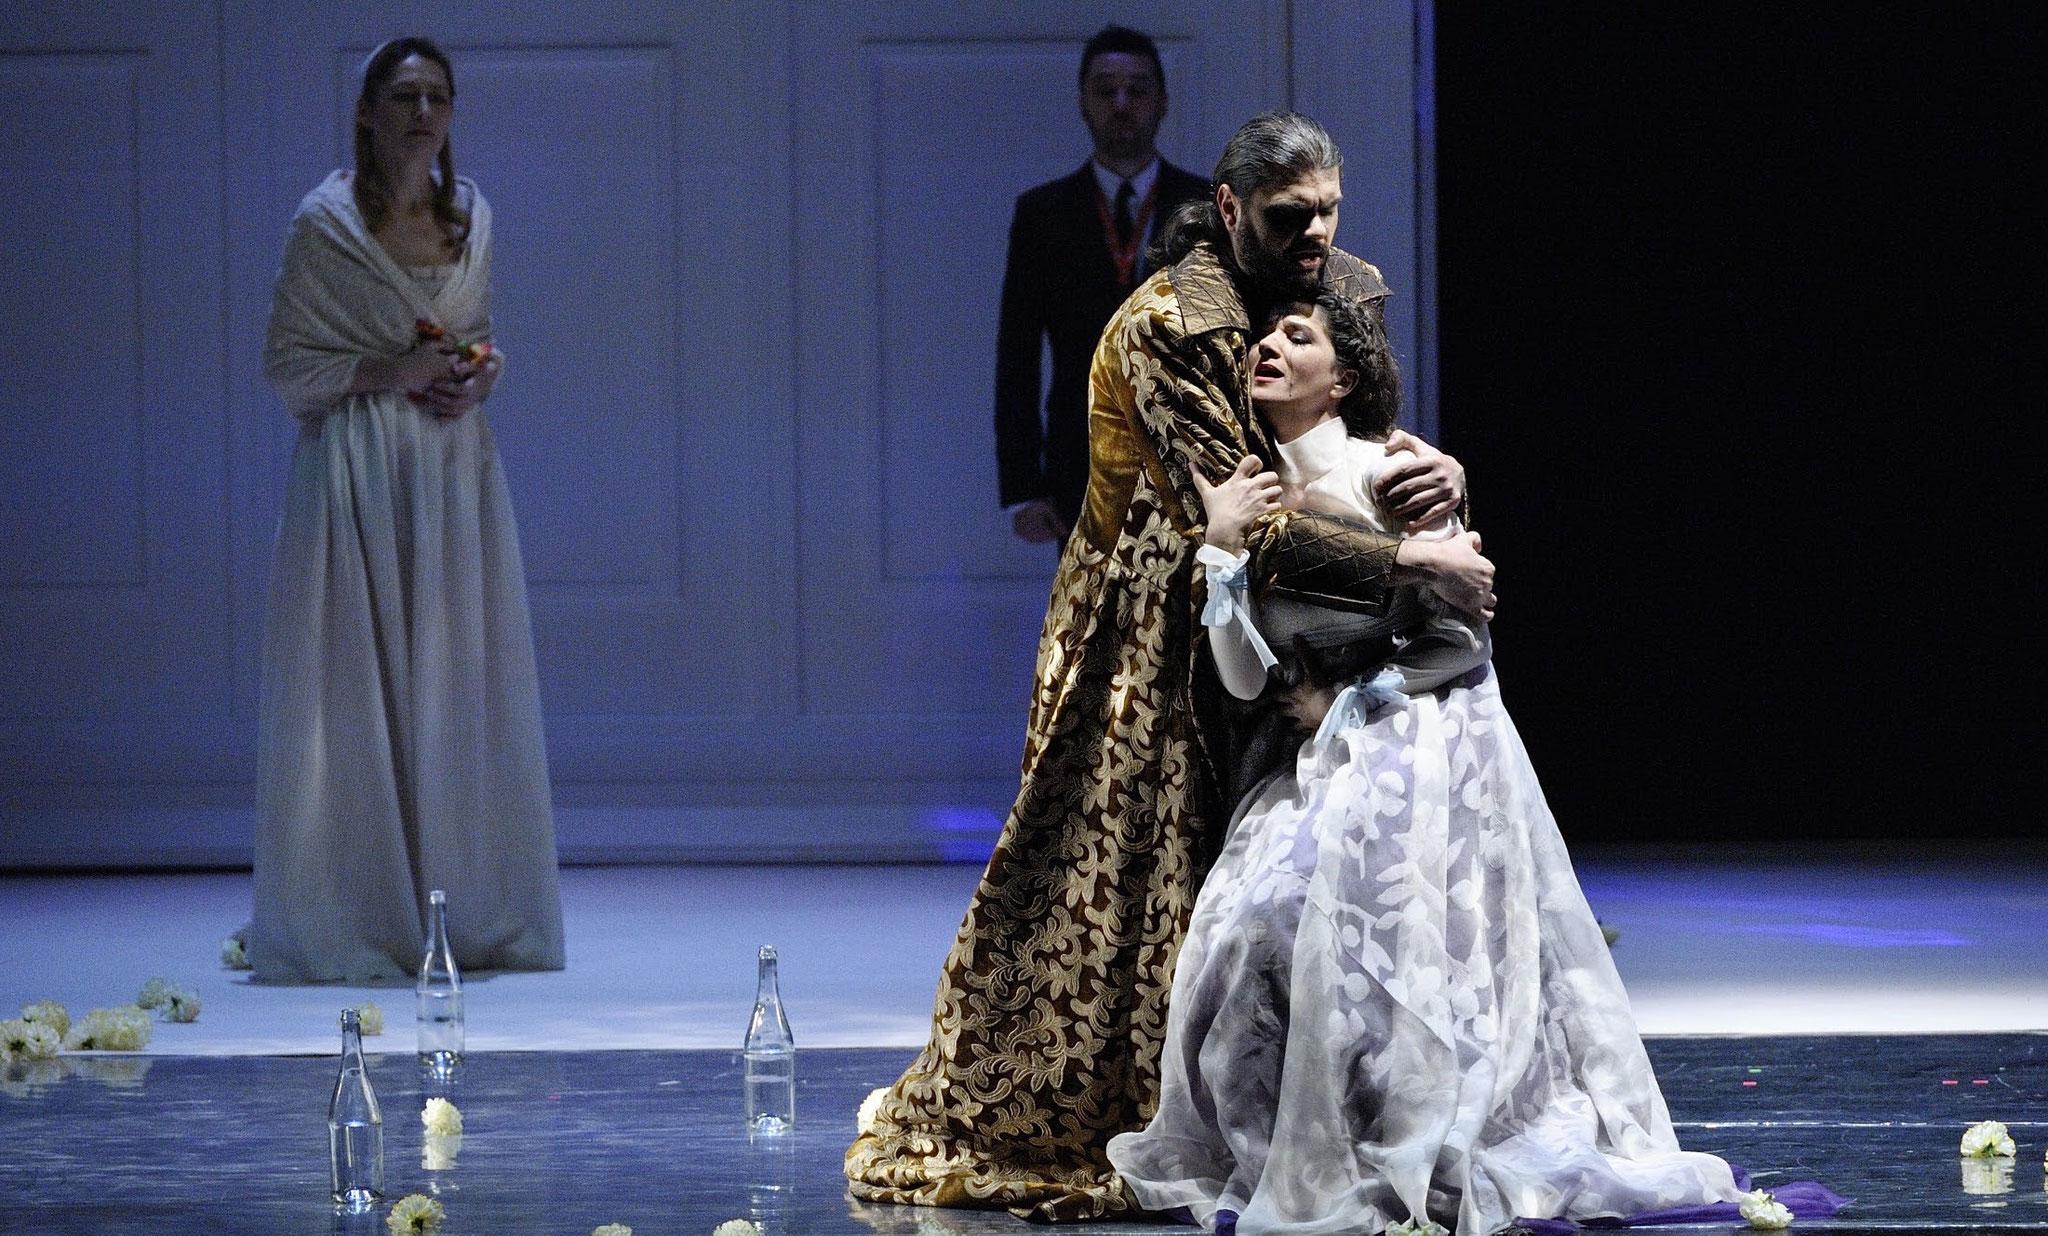 The Rape of Lucretia/National Theater Antonin Dvorak